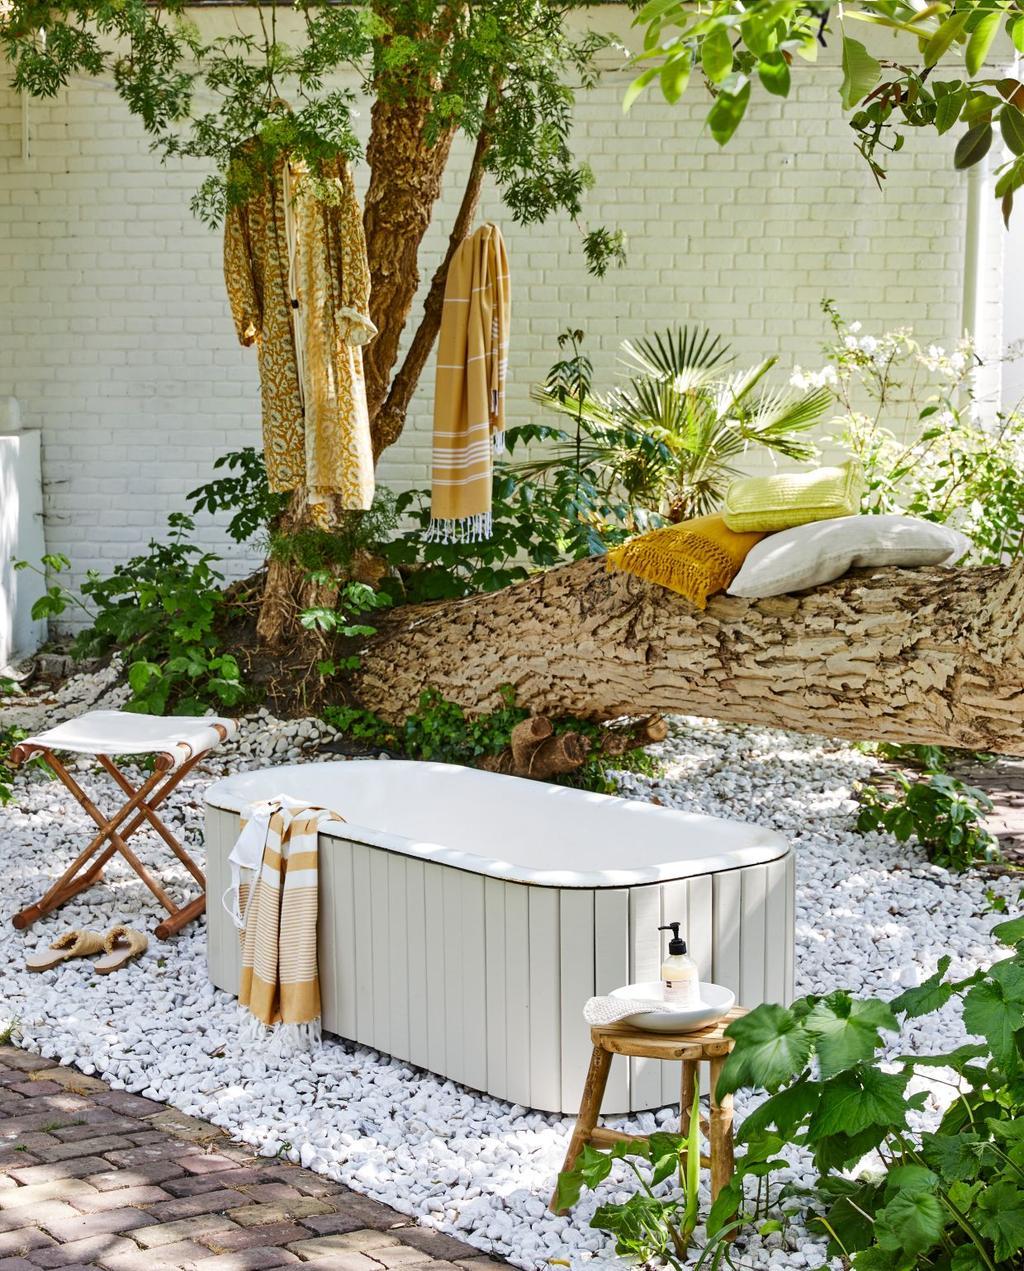 vtwonen 07-2020 | styling tuin buitenbad